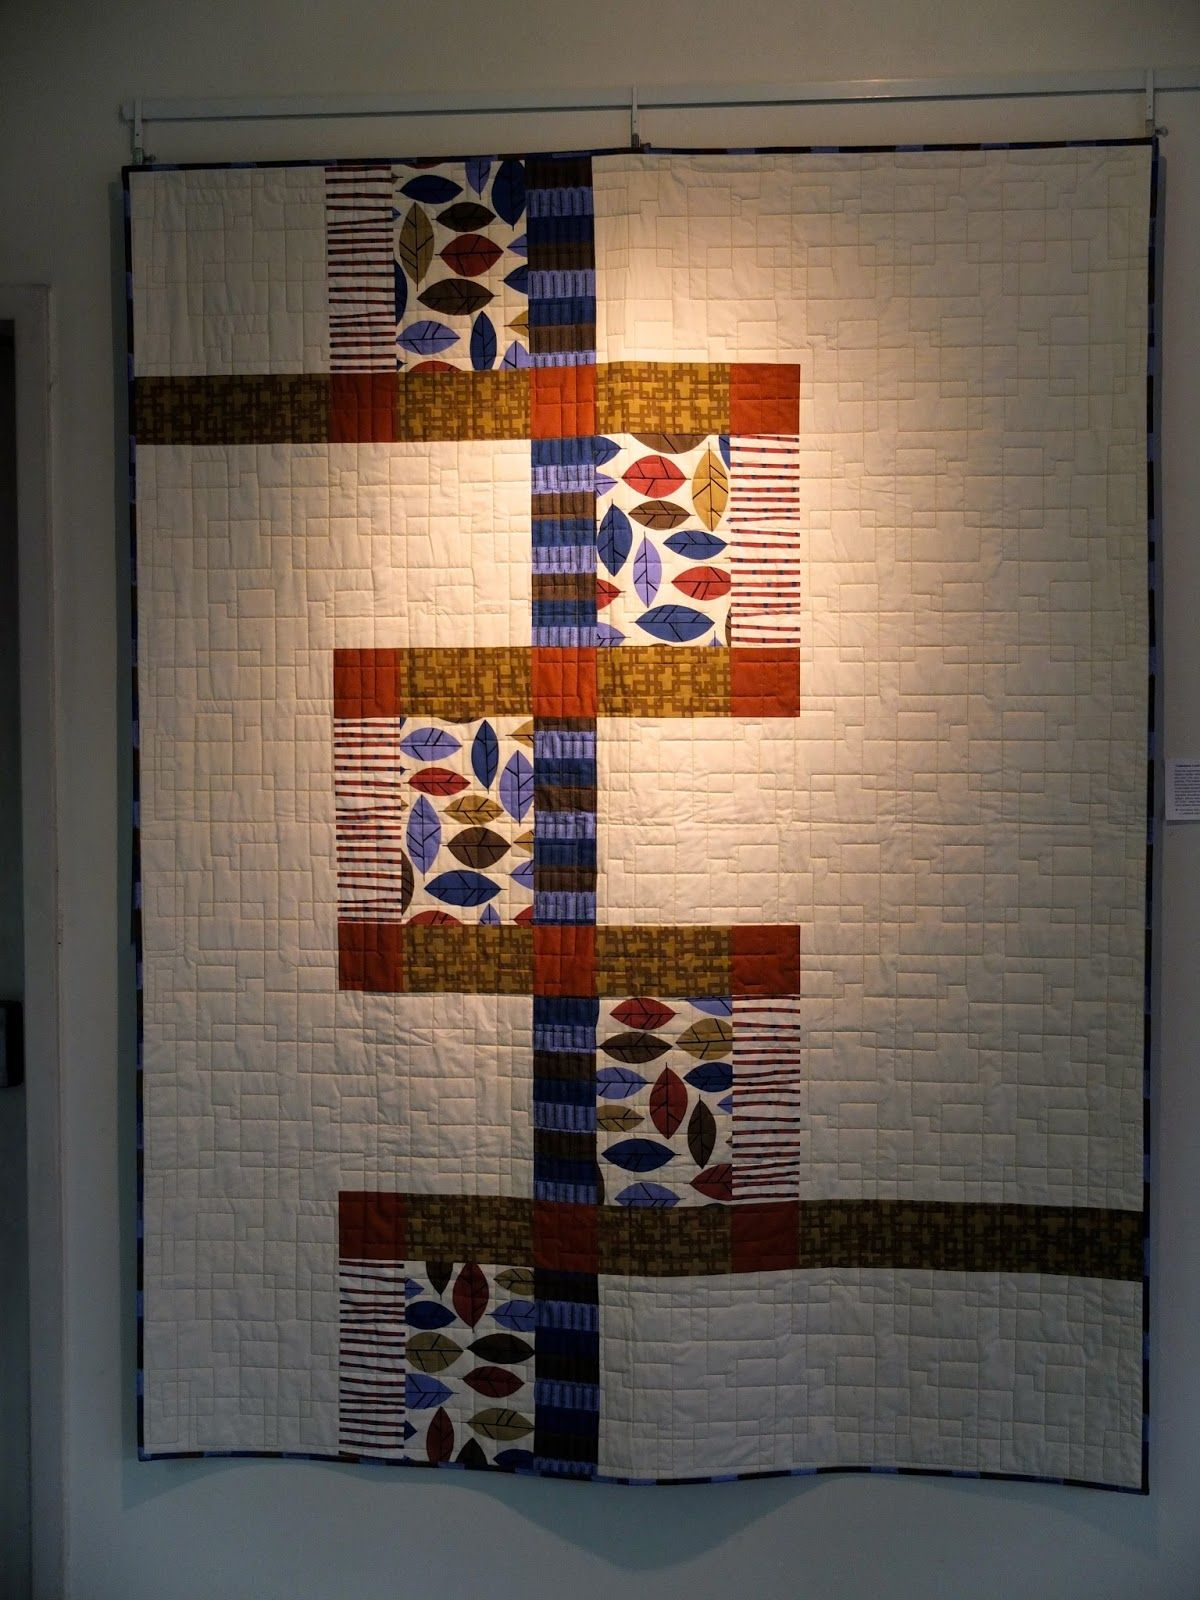 Modern Quilt Relish: Des Moines Modern Quilt Guild show up in the ... : quilt show des moines - Adamdwight.com